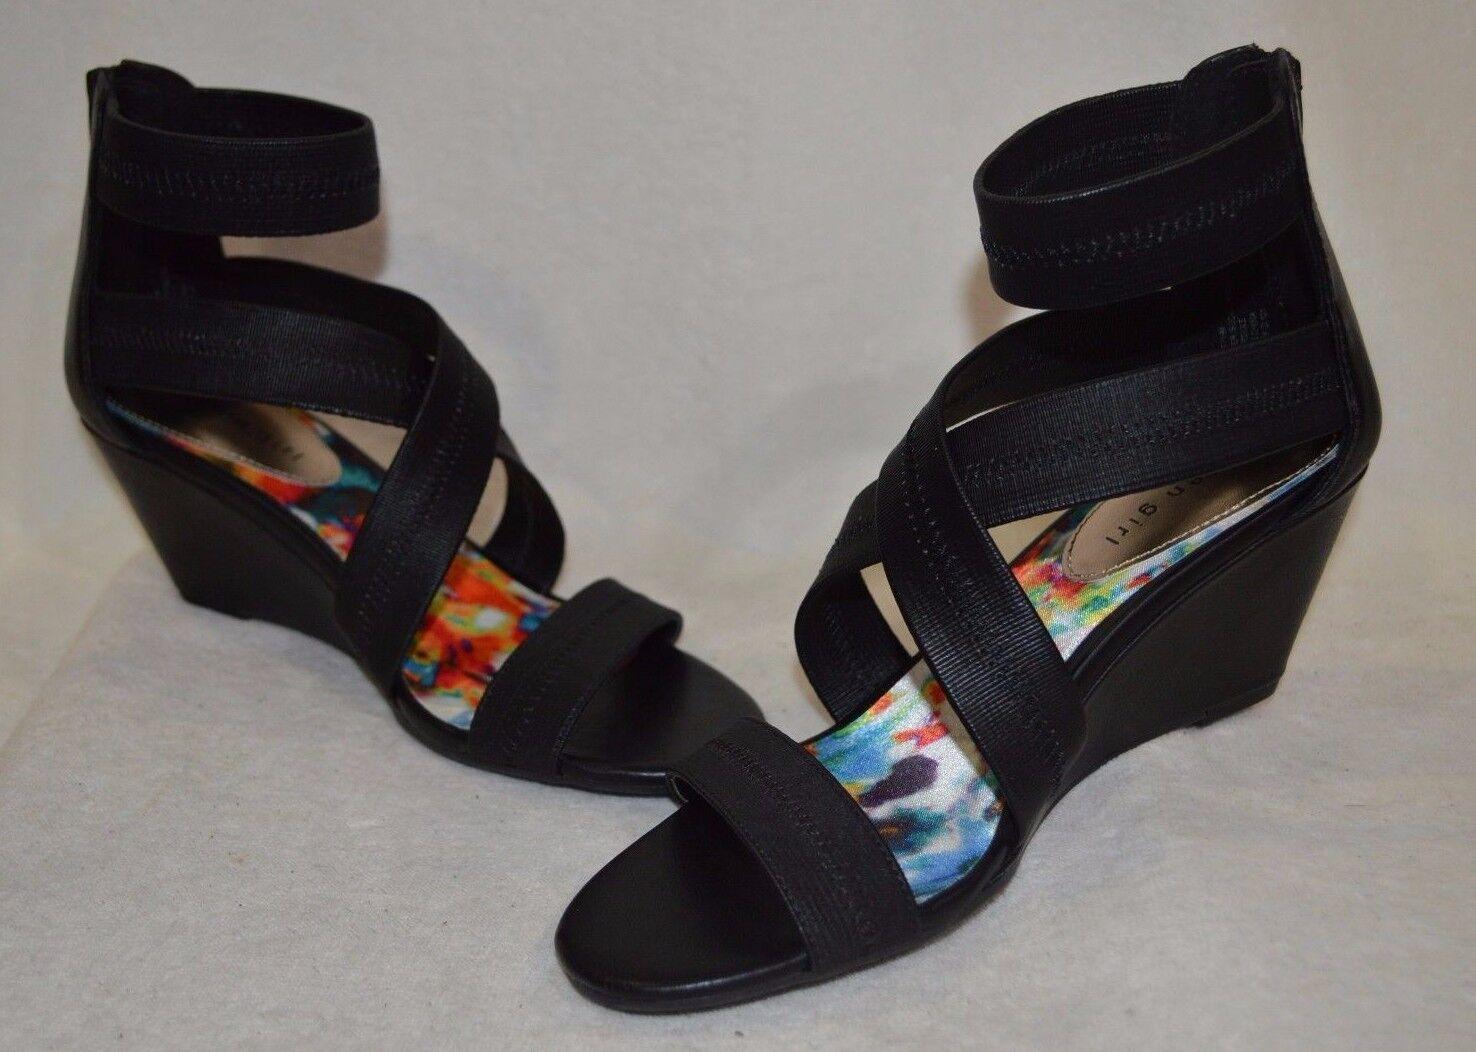 Madden Girl Women' Heartt Black Strappy Wedge Sandals - Size